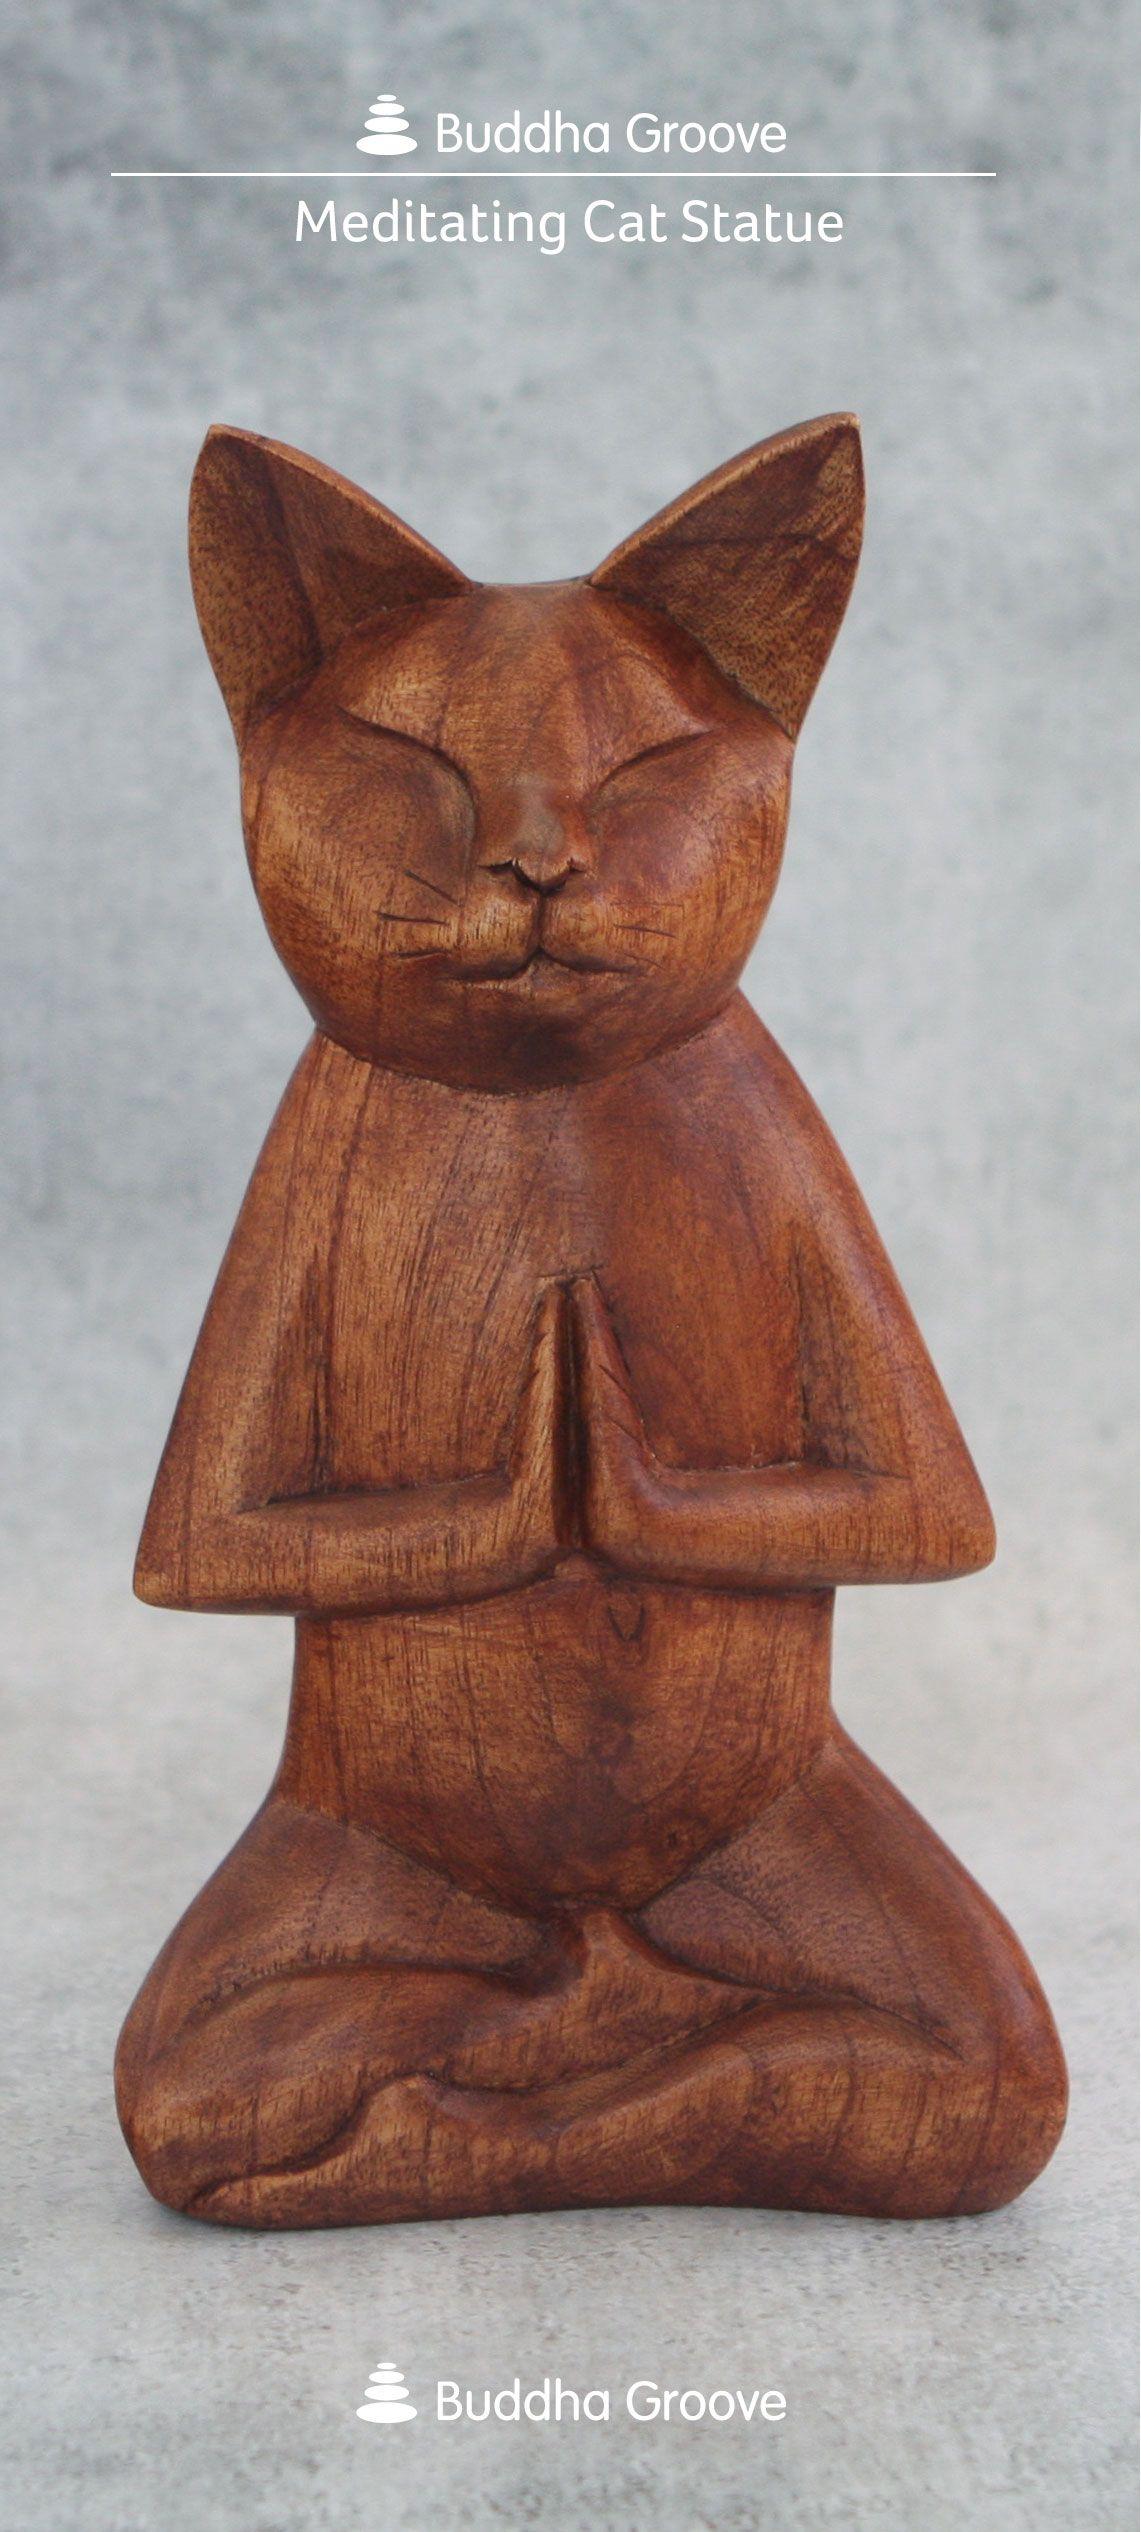 Meditating Cat Statue